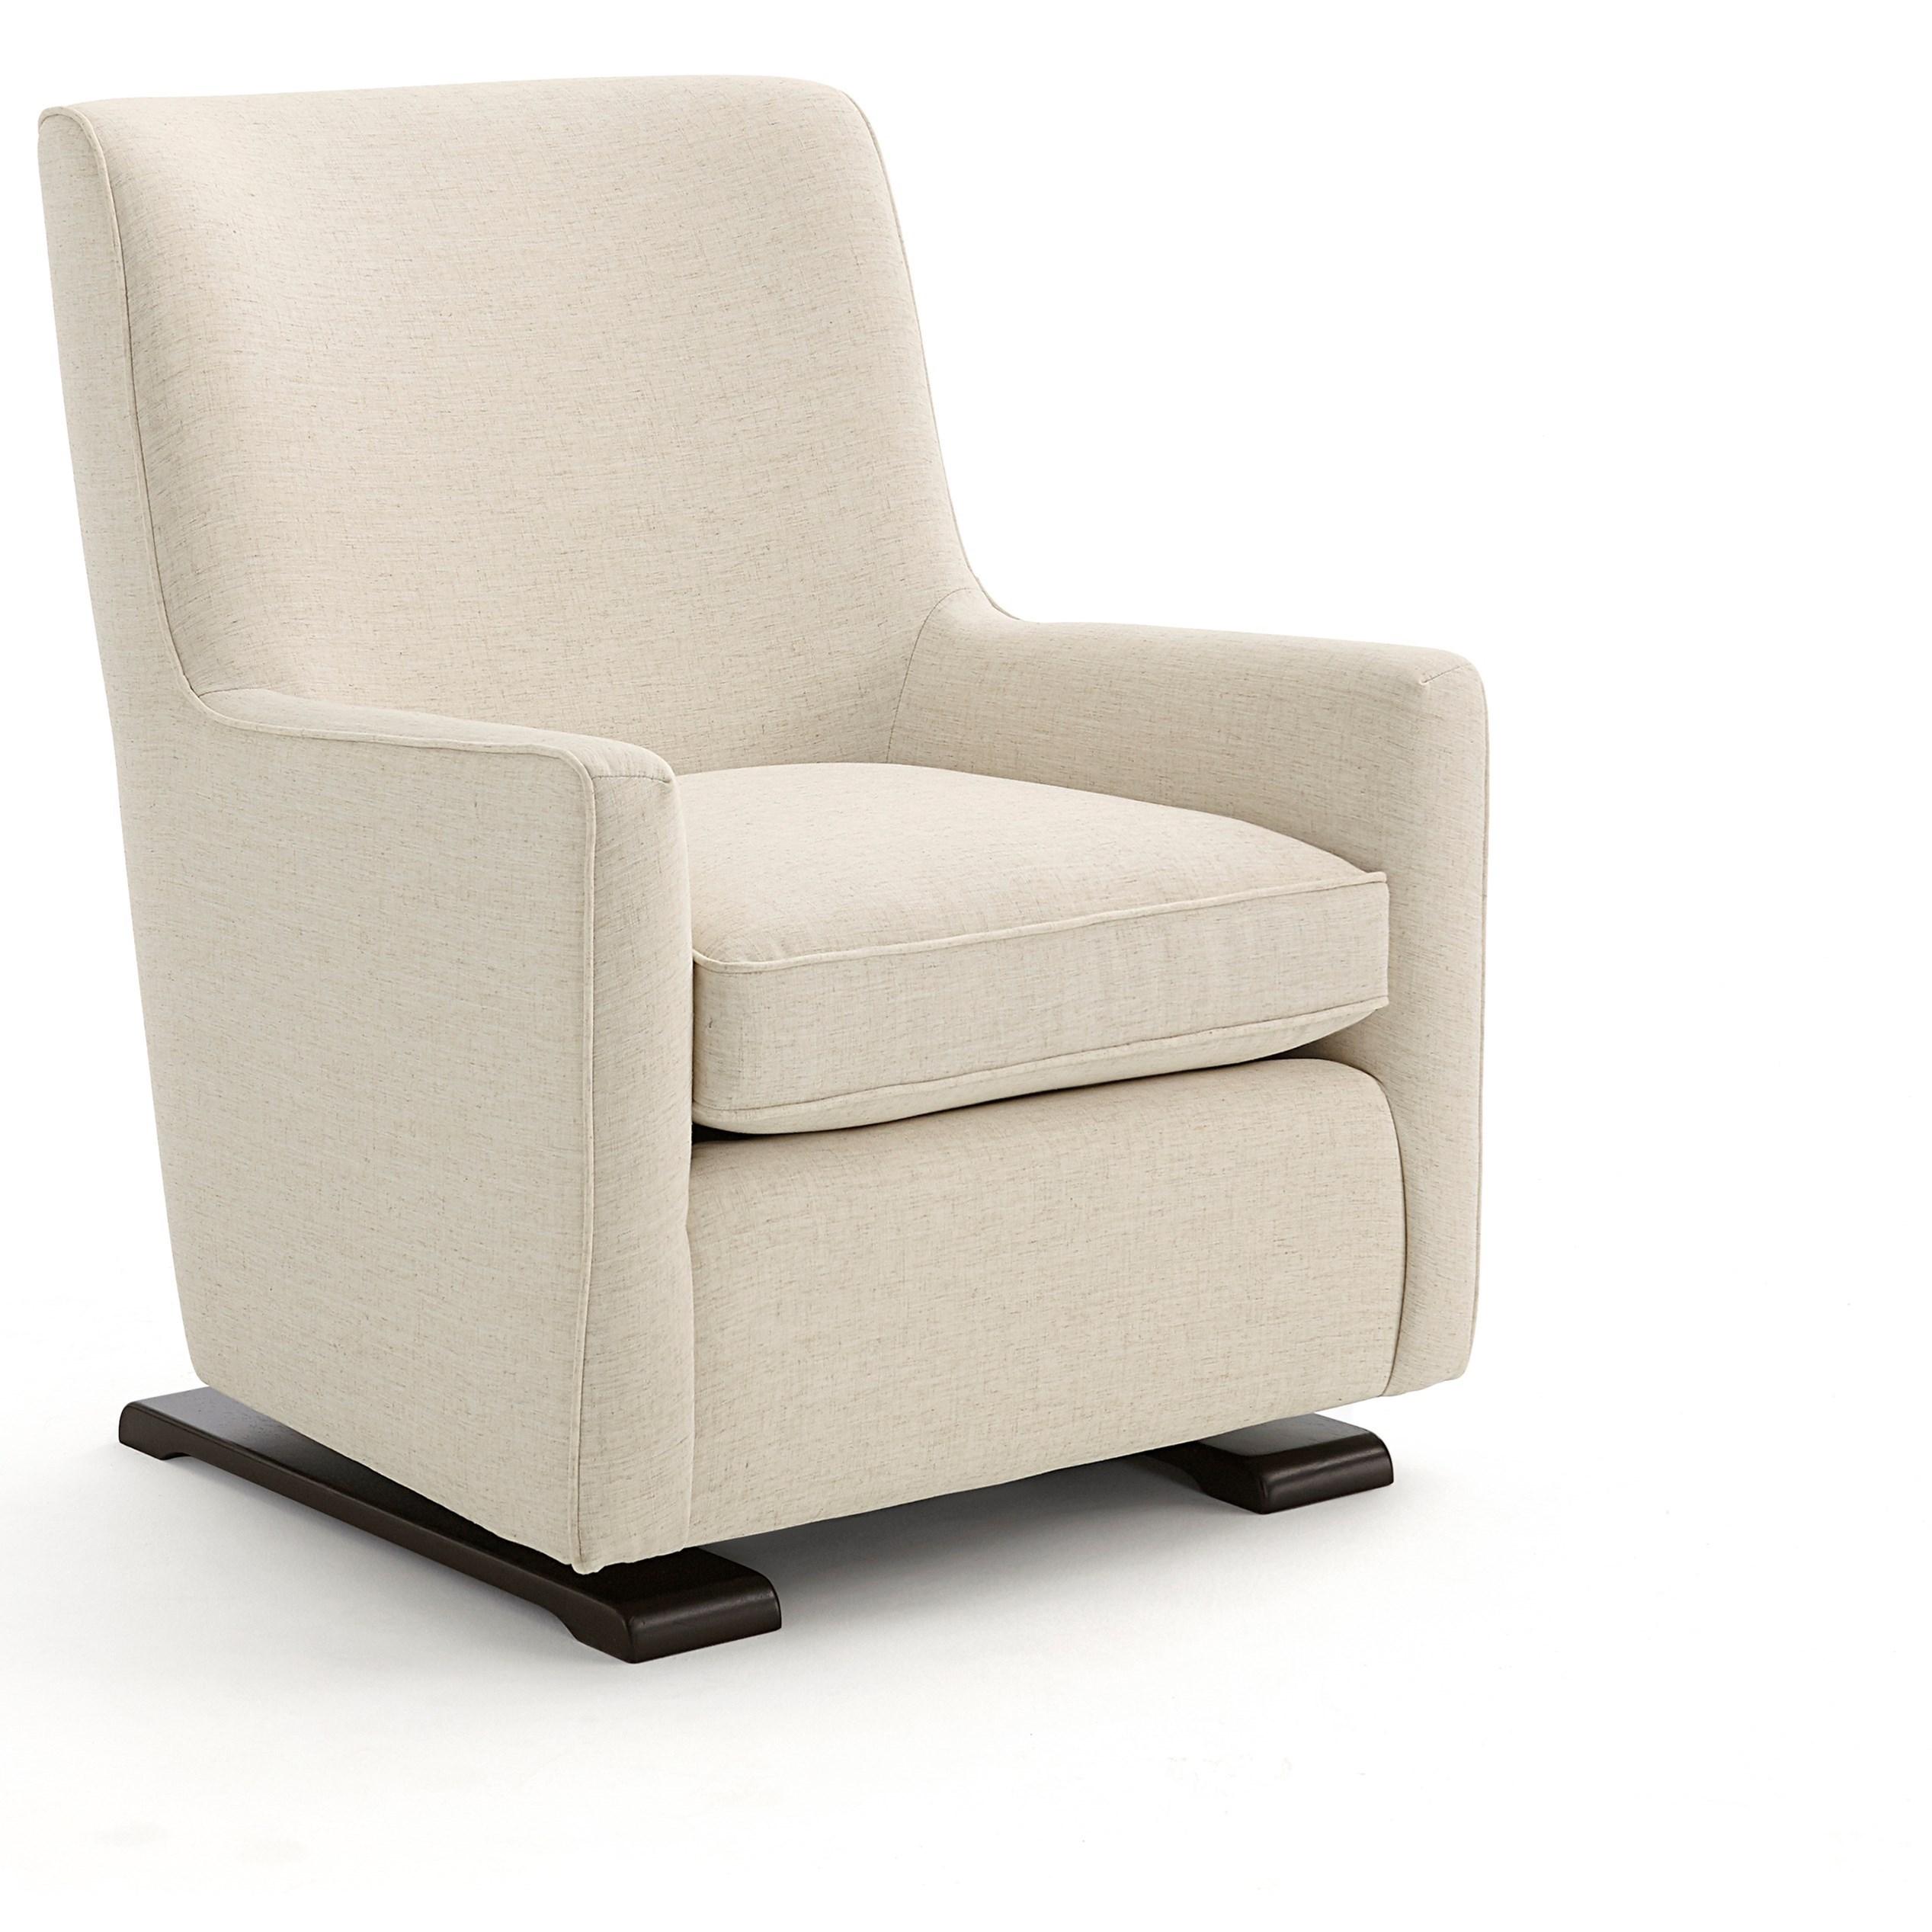 Coral Swivel Glider Chair